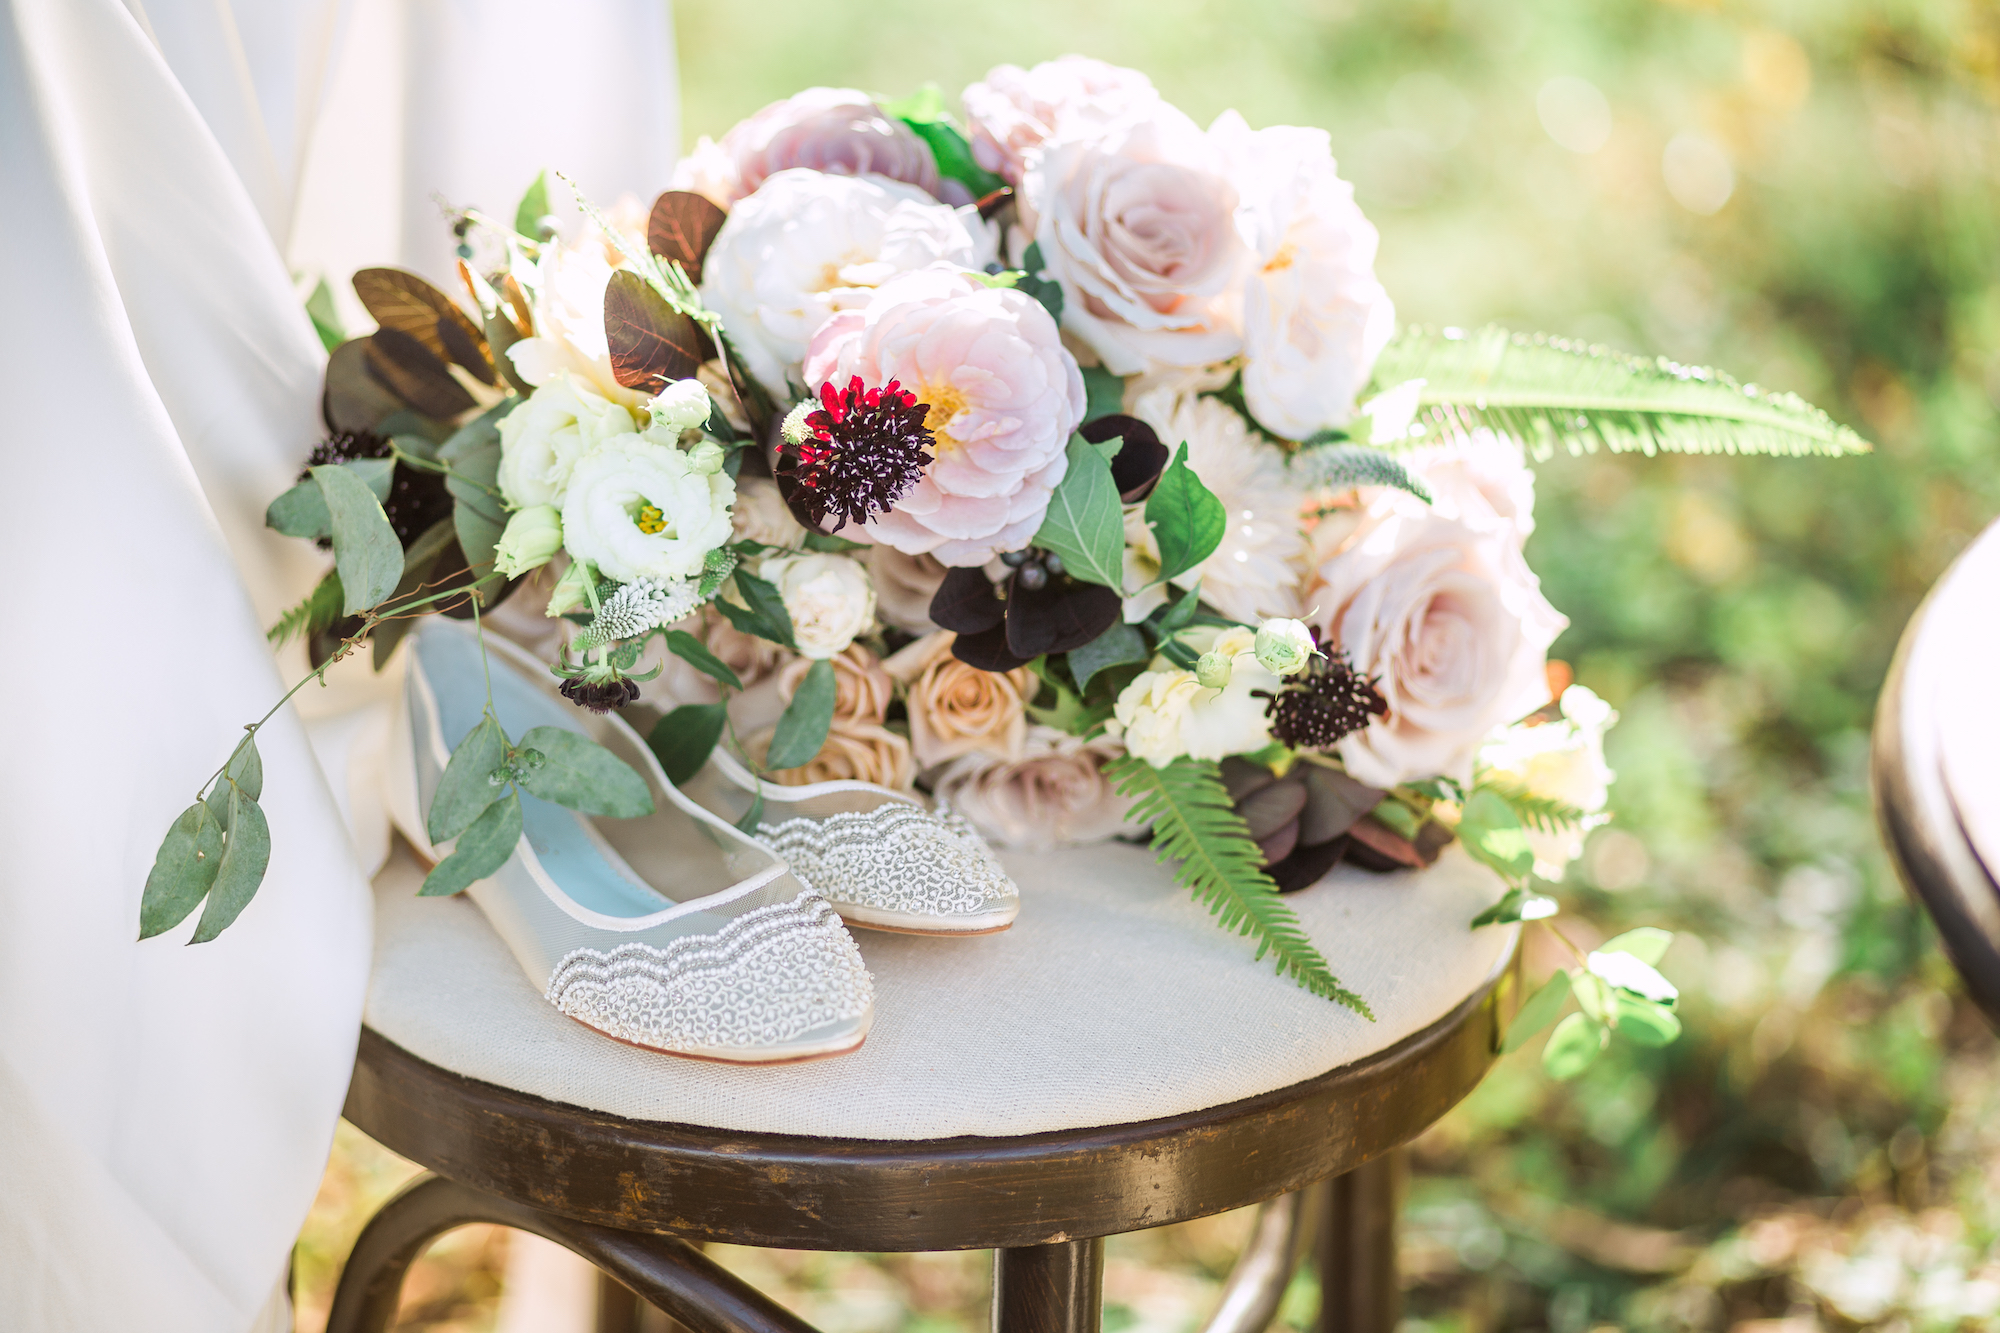 Boutique-DC-MD-VA-Event-Planner-Wedding-Designer-A-Griffin-Events-Fall-Elopement109.jpg